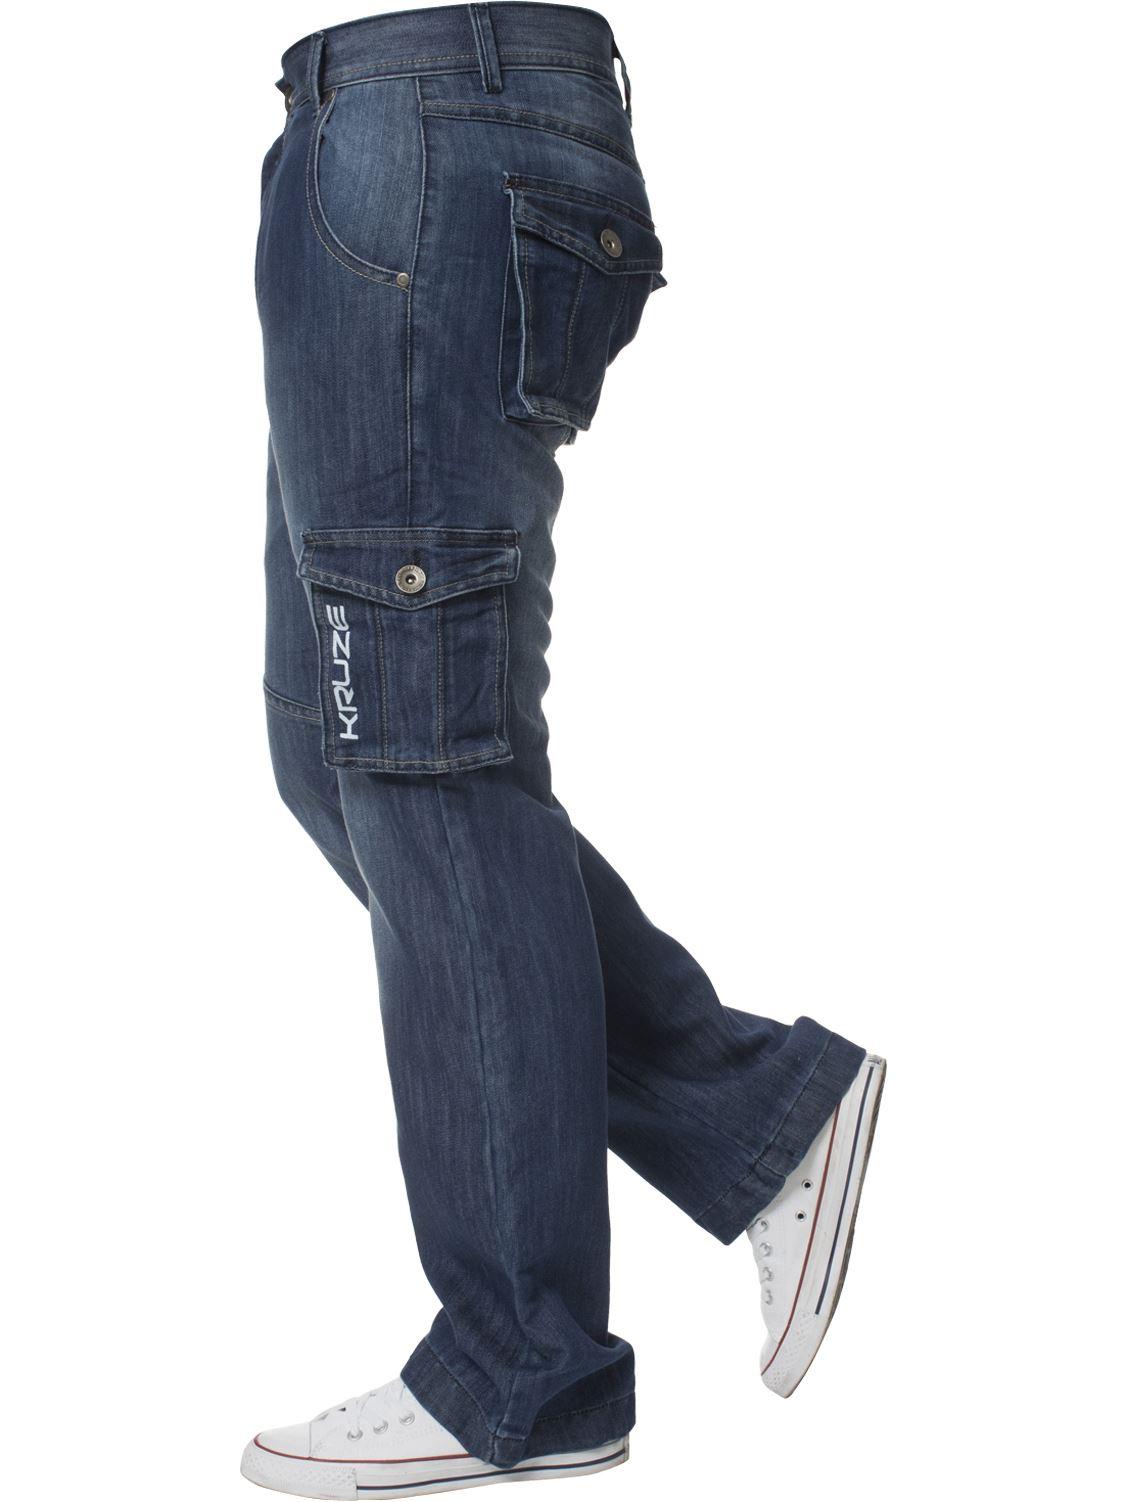 Grandes-jeans-para-hombre-de-combate-de-Kruze-Rey-Alto-Pierna-Cargo-Pantalones-Jeans-Pantalones miniatura 5